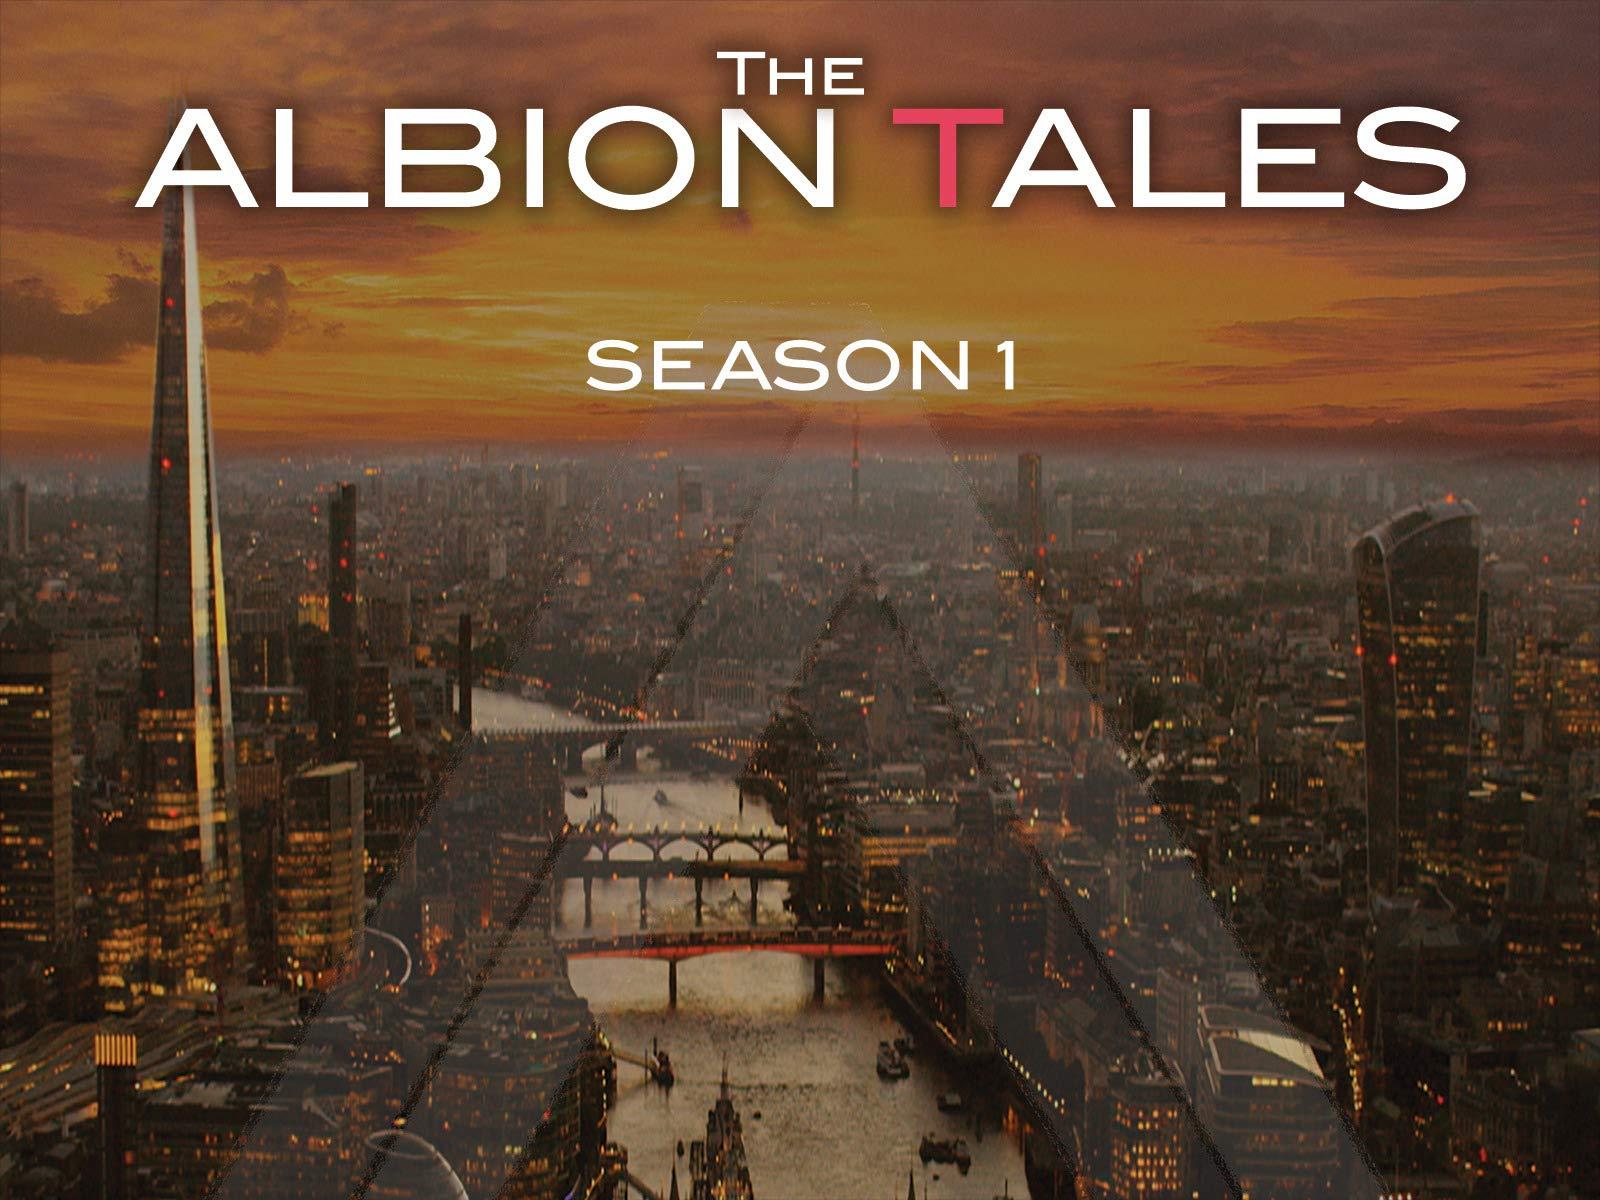 The Albion Tales - Season 1